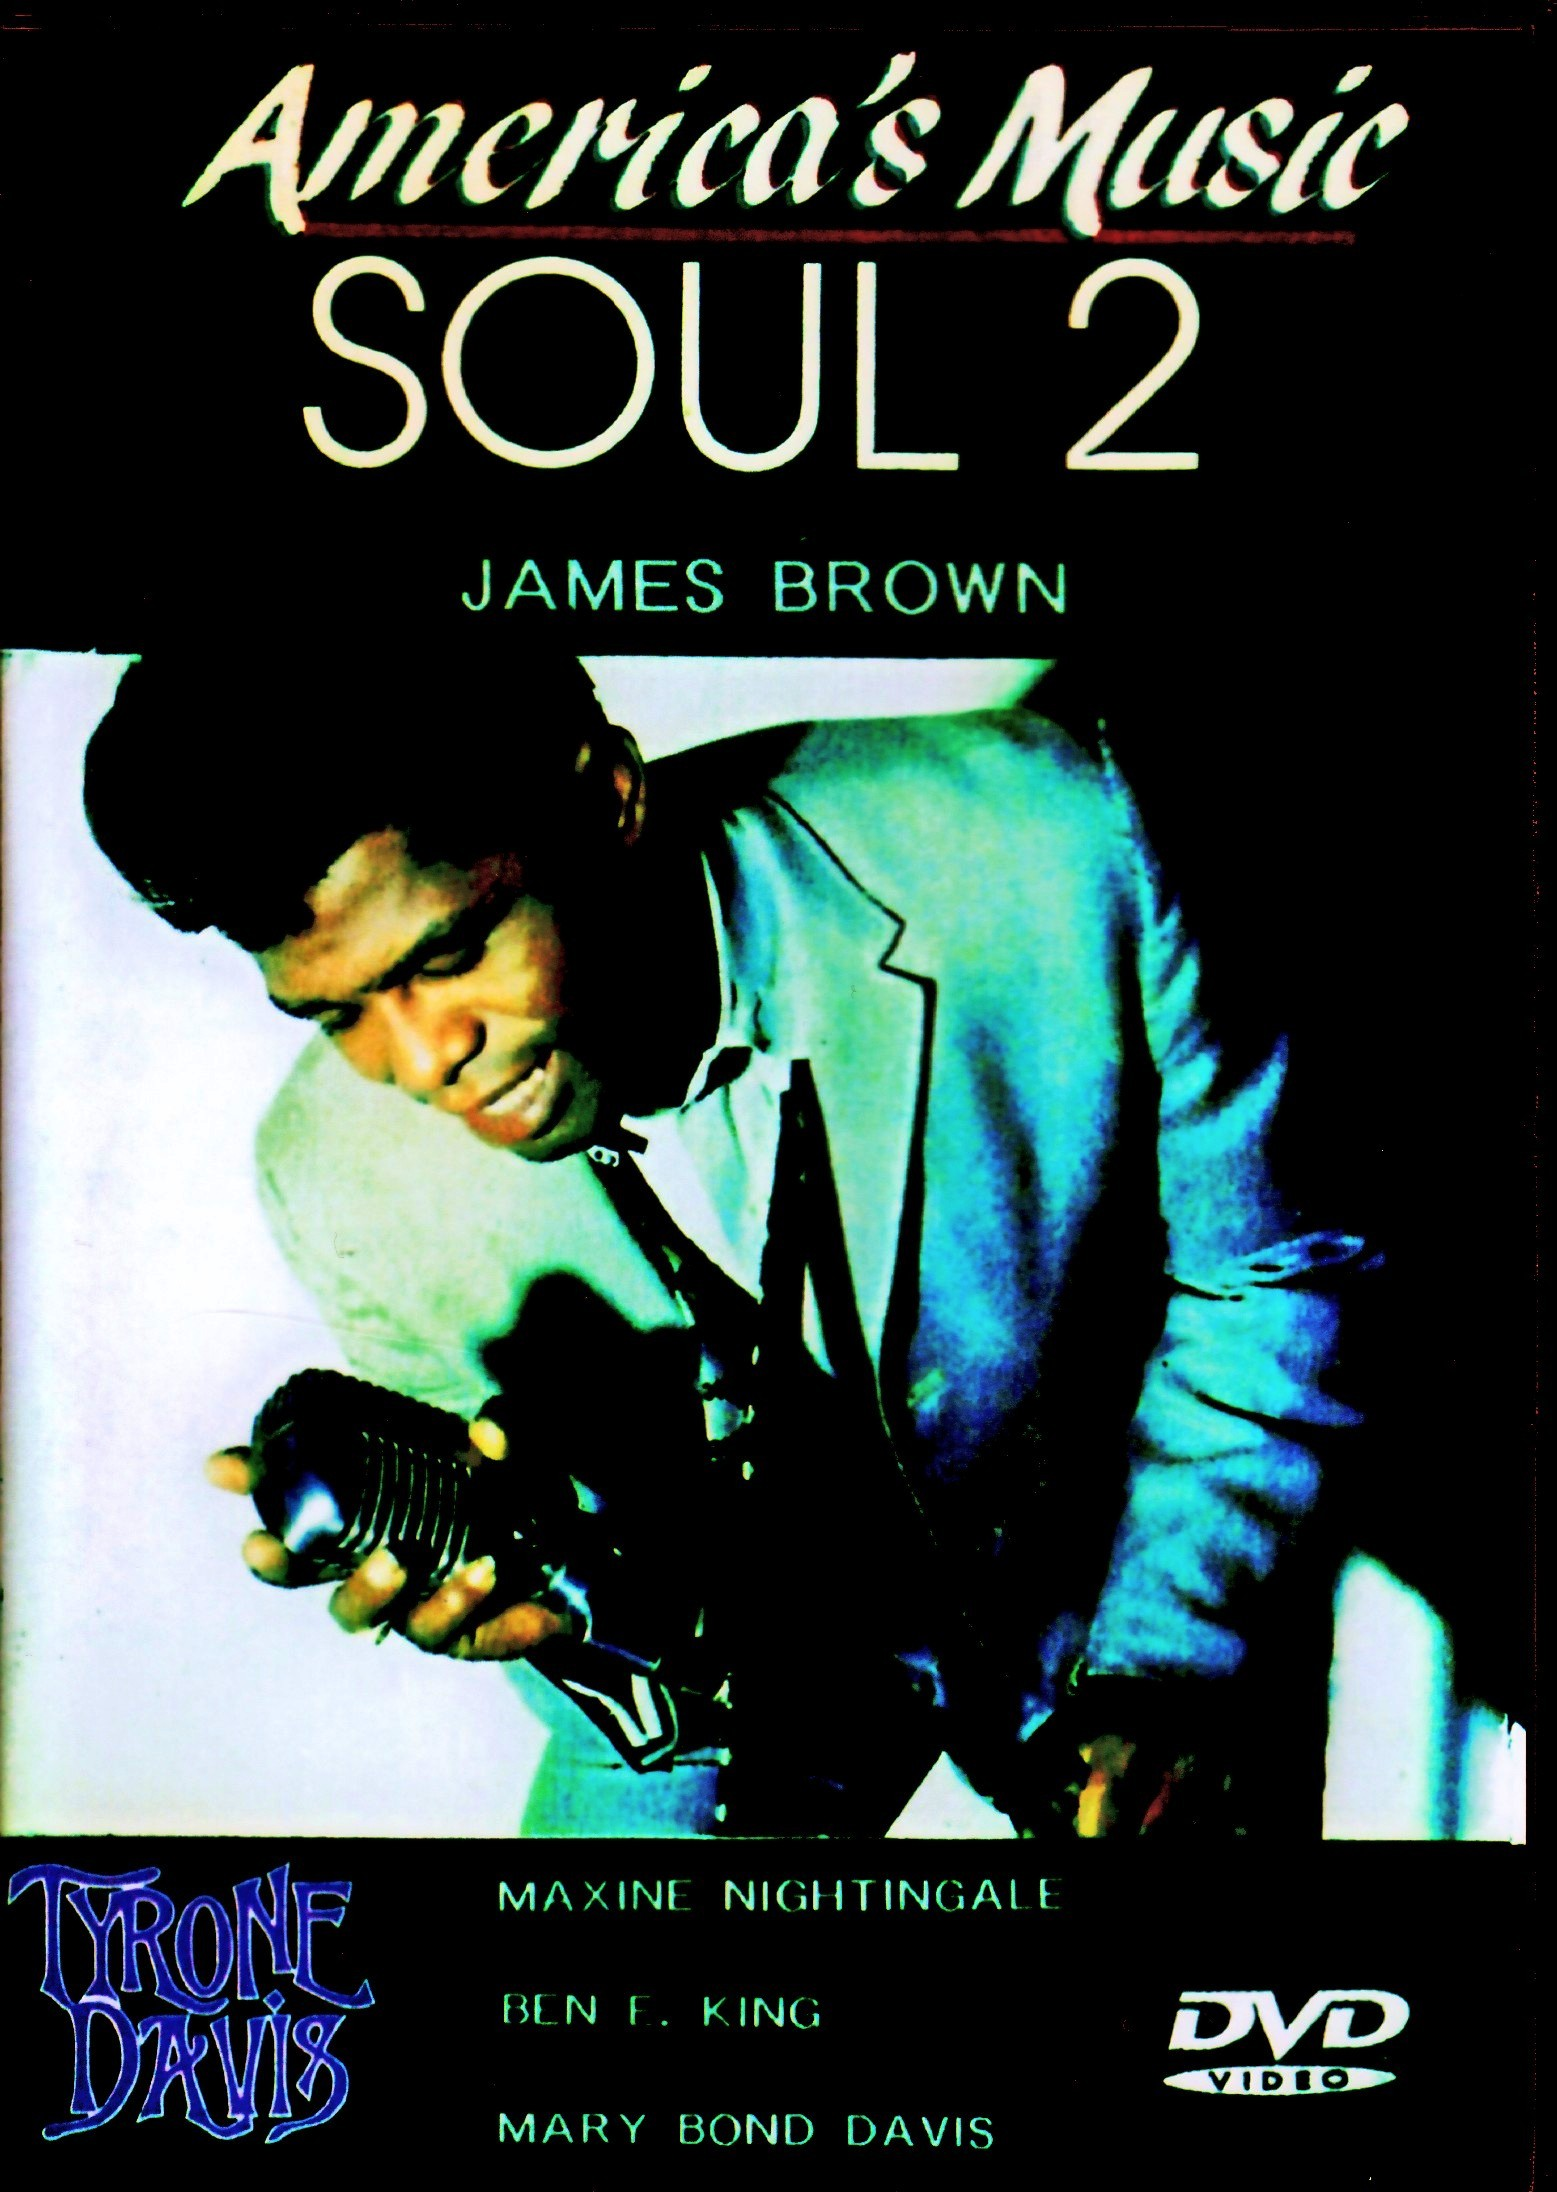 Various Artists James Brown,Ben E. King,Tyrone Davis,Maxine Nightingale/America's Music Soul Vol.2